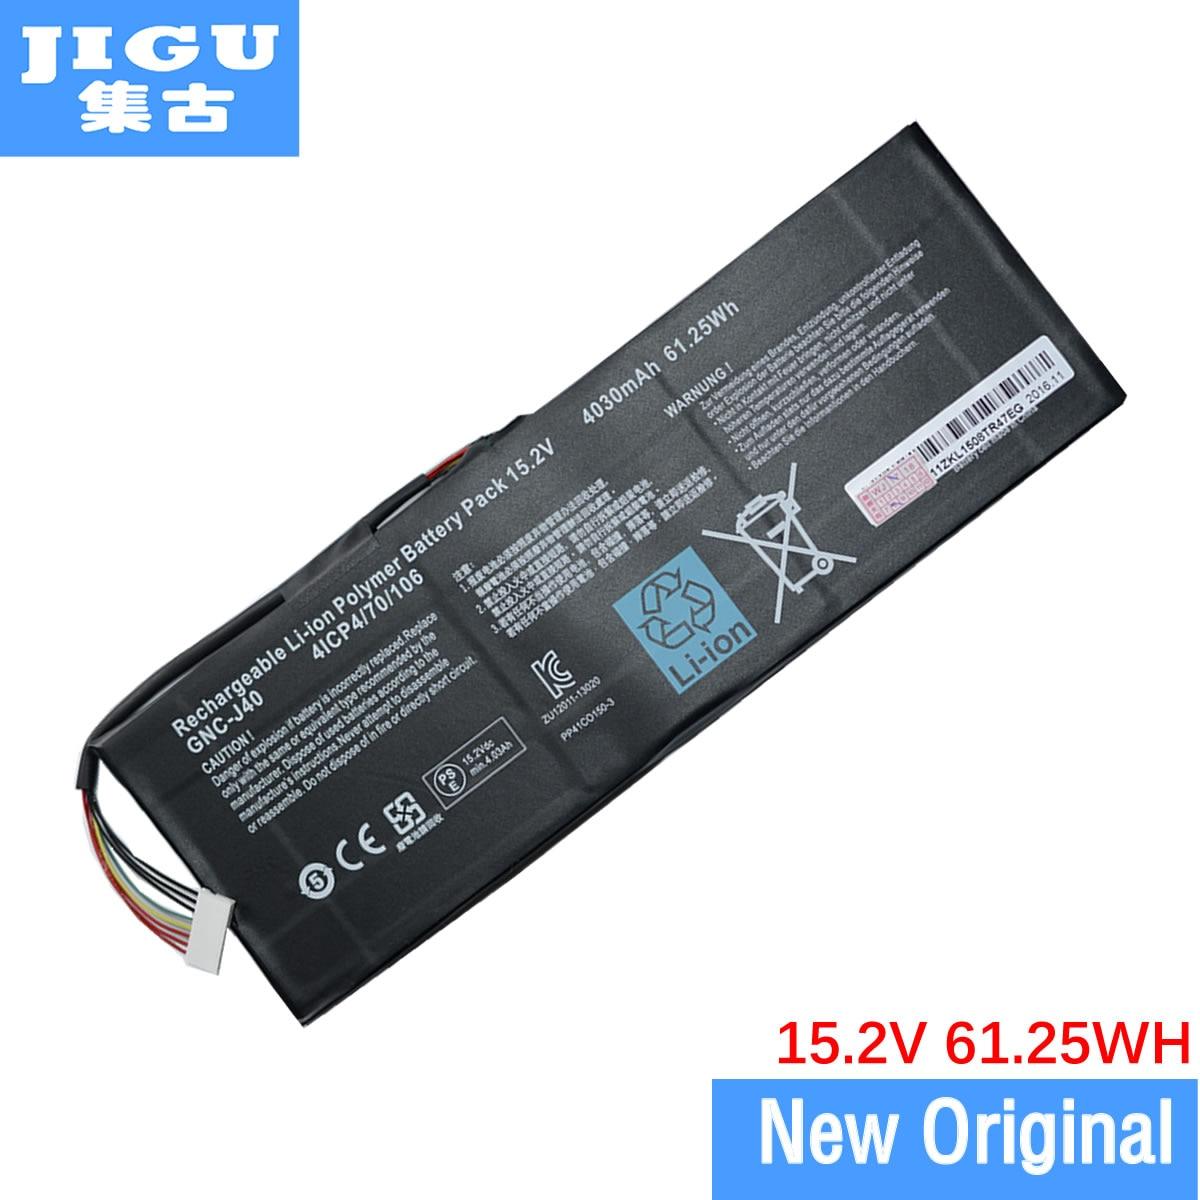 JIGU Original Laptop battery 916TA013F GNC-J40 For SCHENKER XMG C504 FOR GIGABYTE P34 V4 P34G V2 P34W V3 V4 vi j40 cz